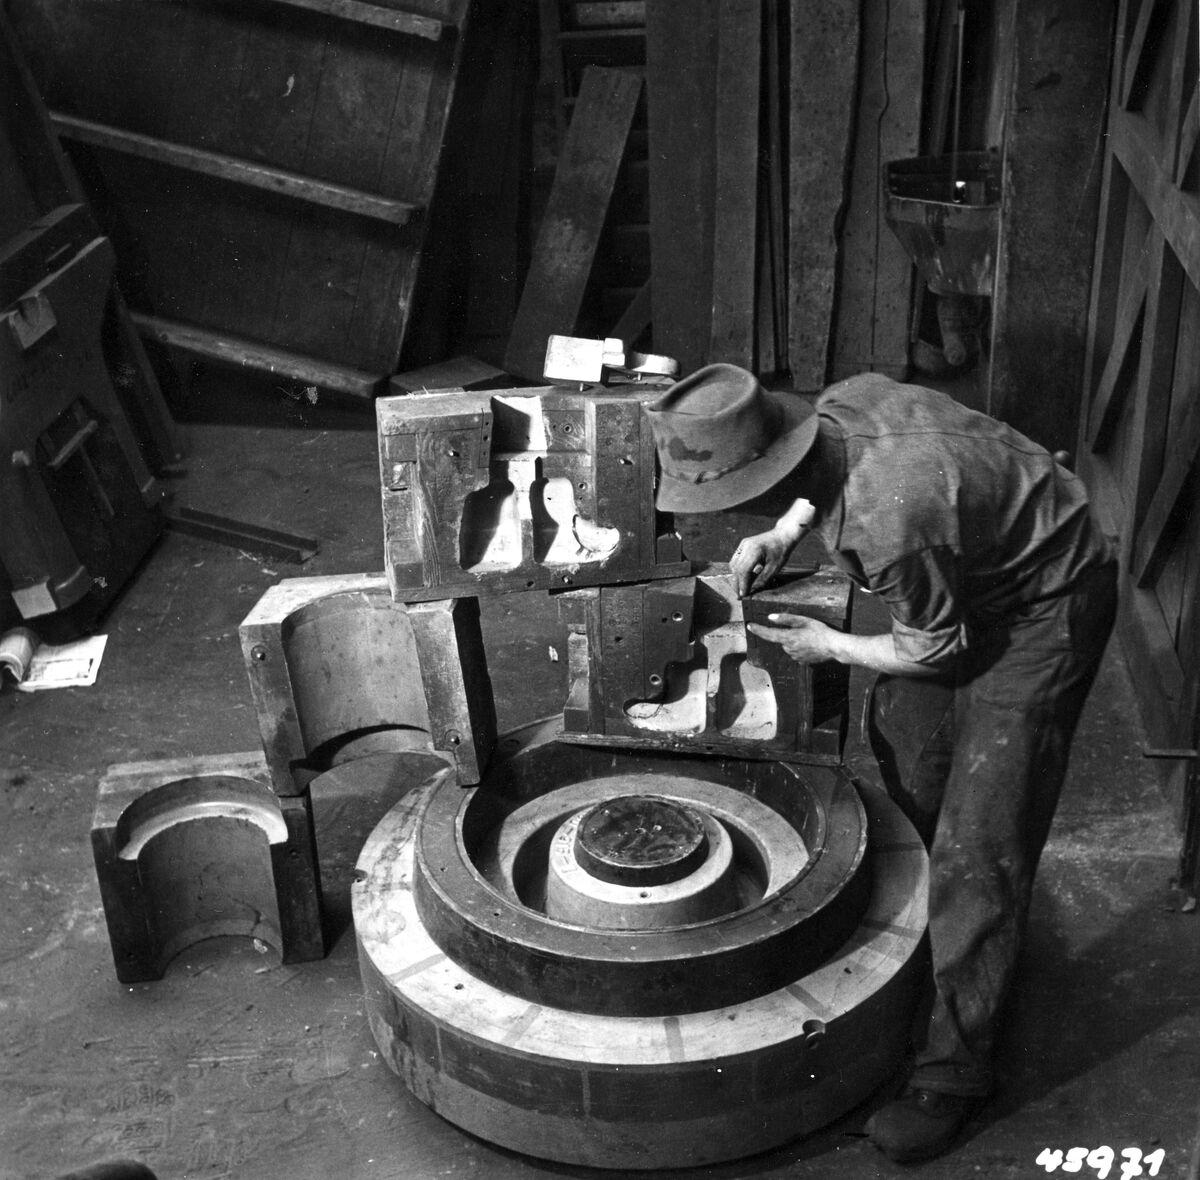 GFA 12/45971: Reportage casting process in malleable casting